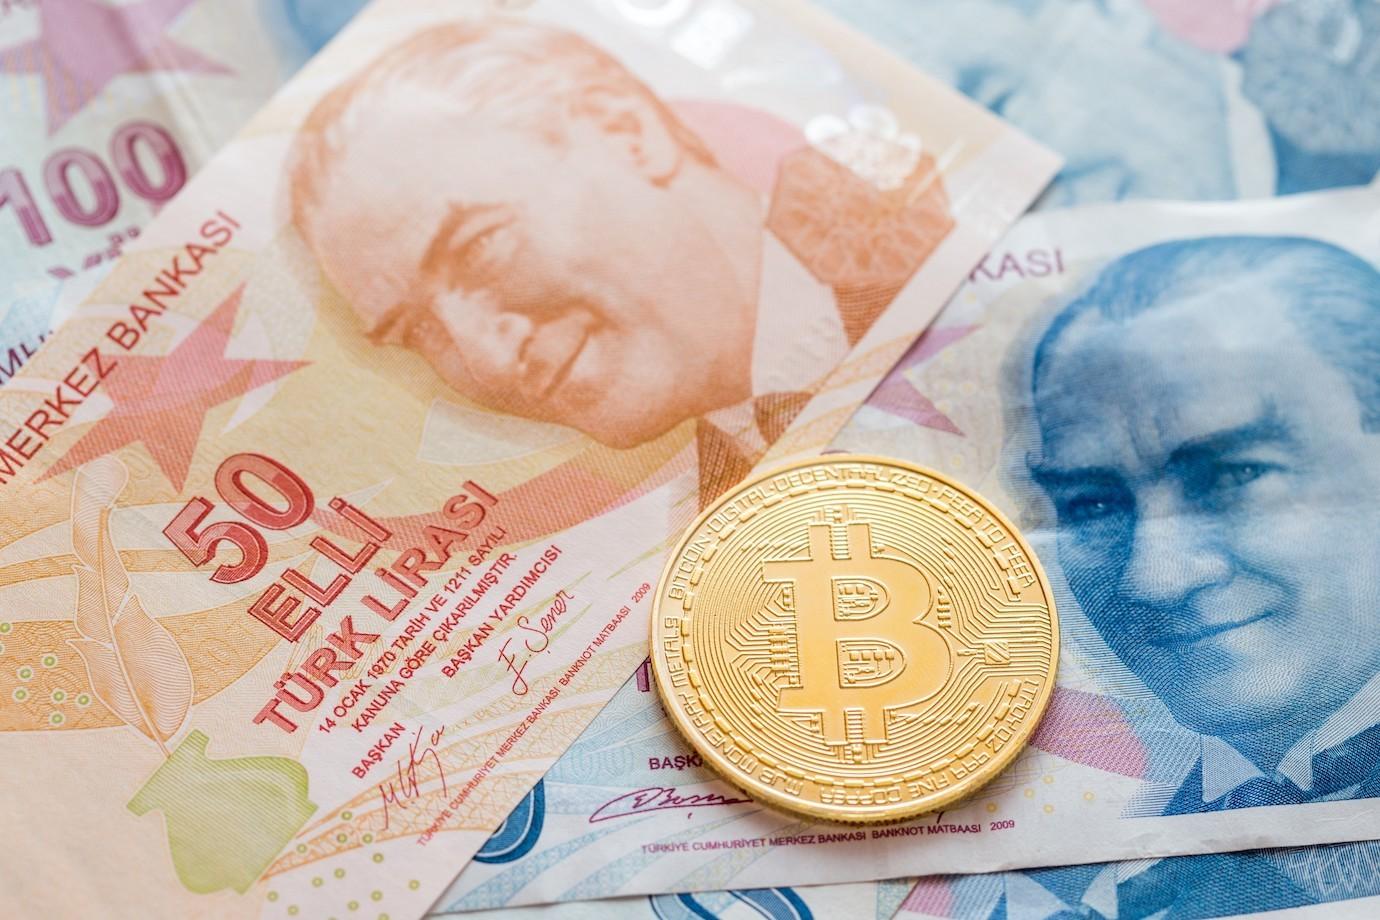 Bitcoin'in (BTC) Fiyatı Ne Kadar? {Tarih} BTC Fiyatı